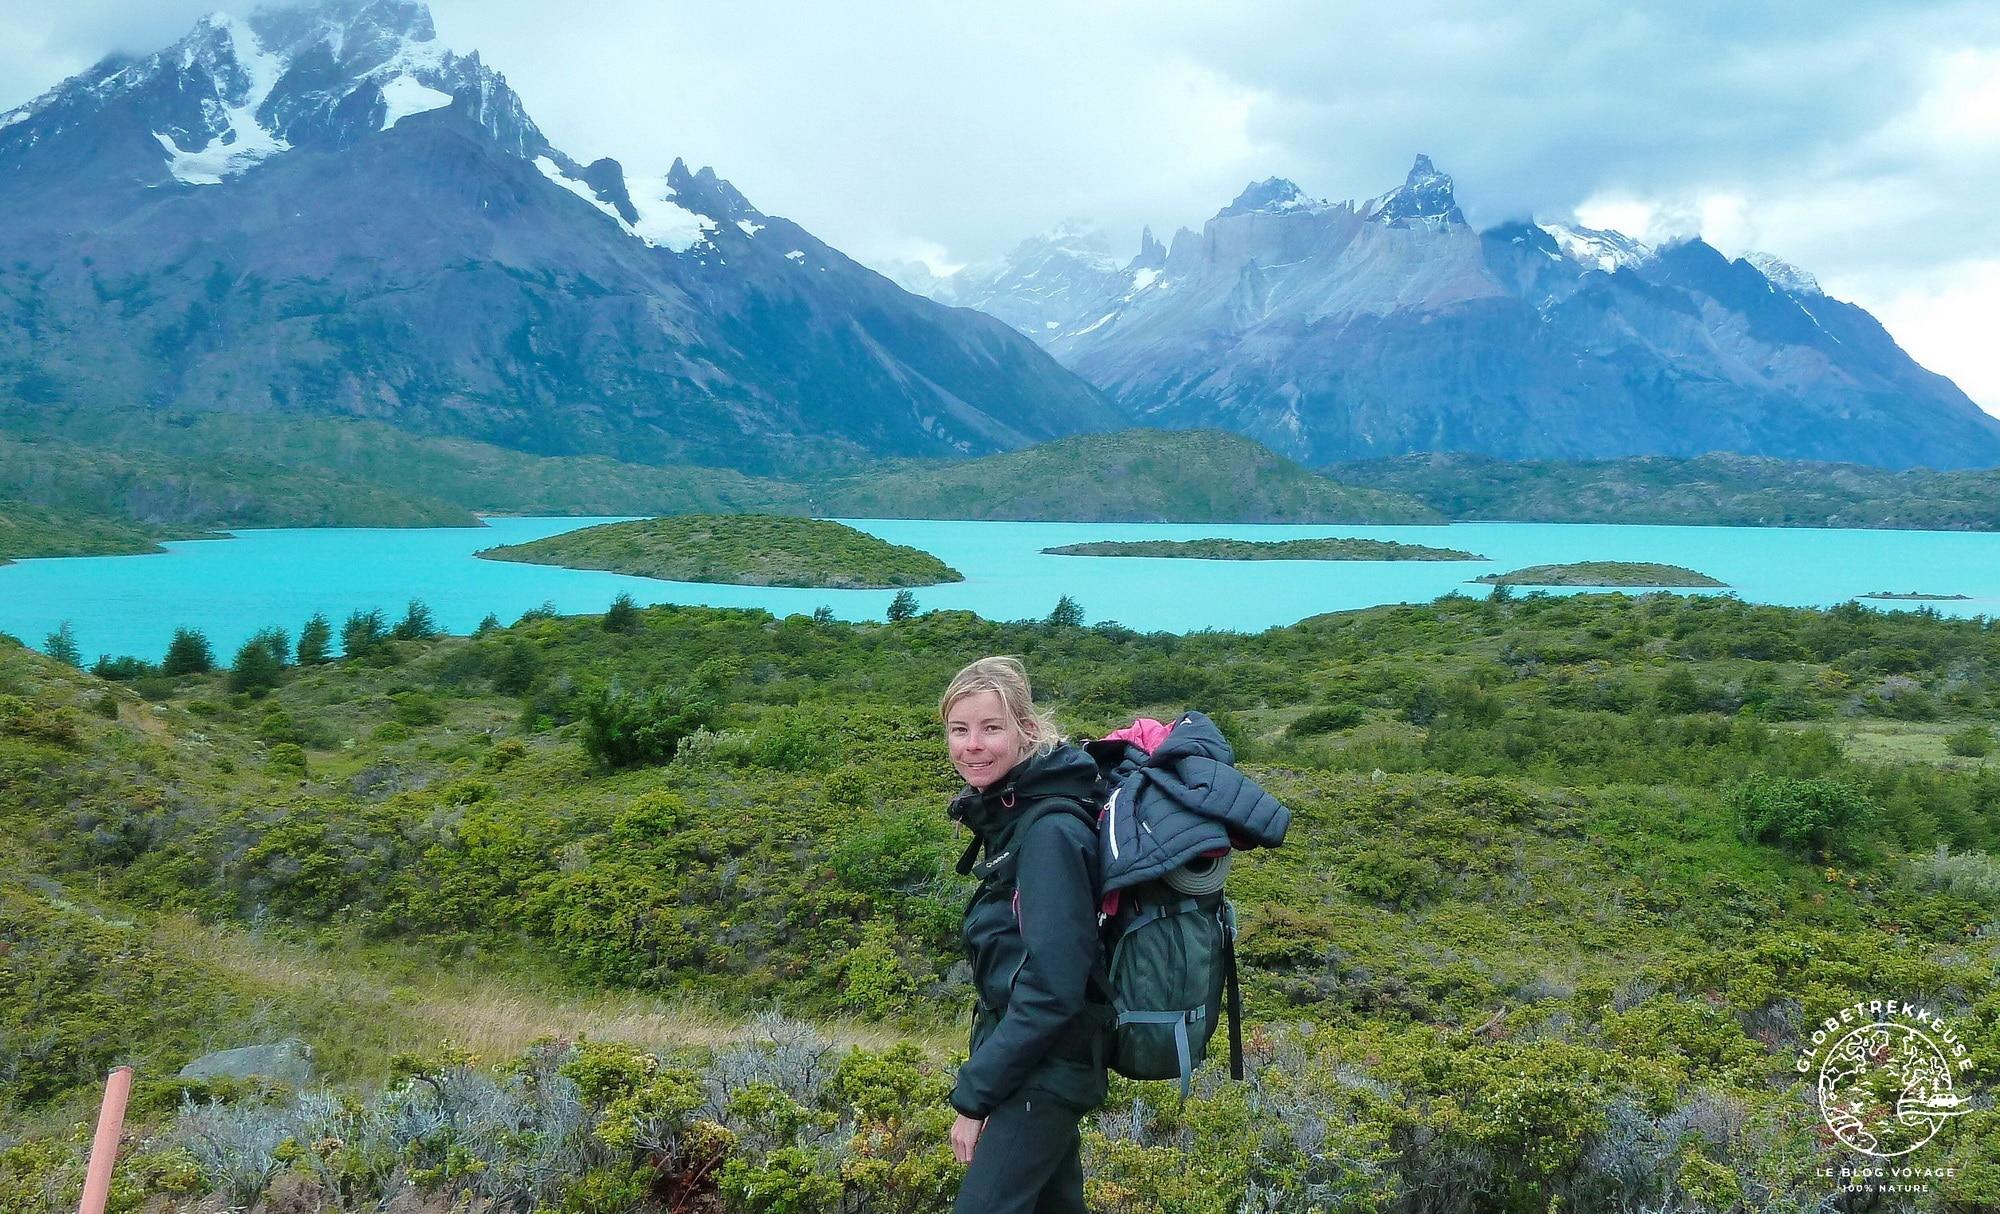 visiter la patagonie torres del paine globetrekkeuse